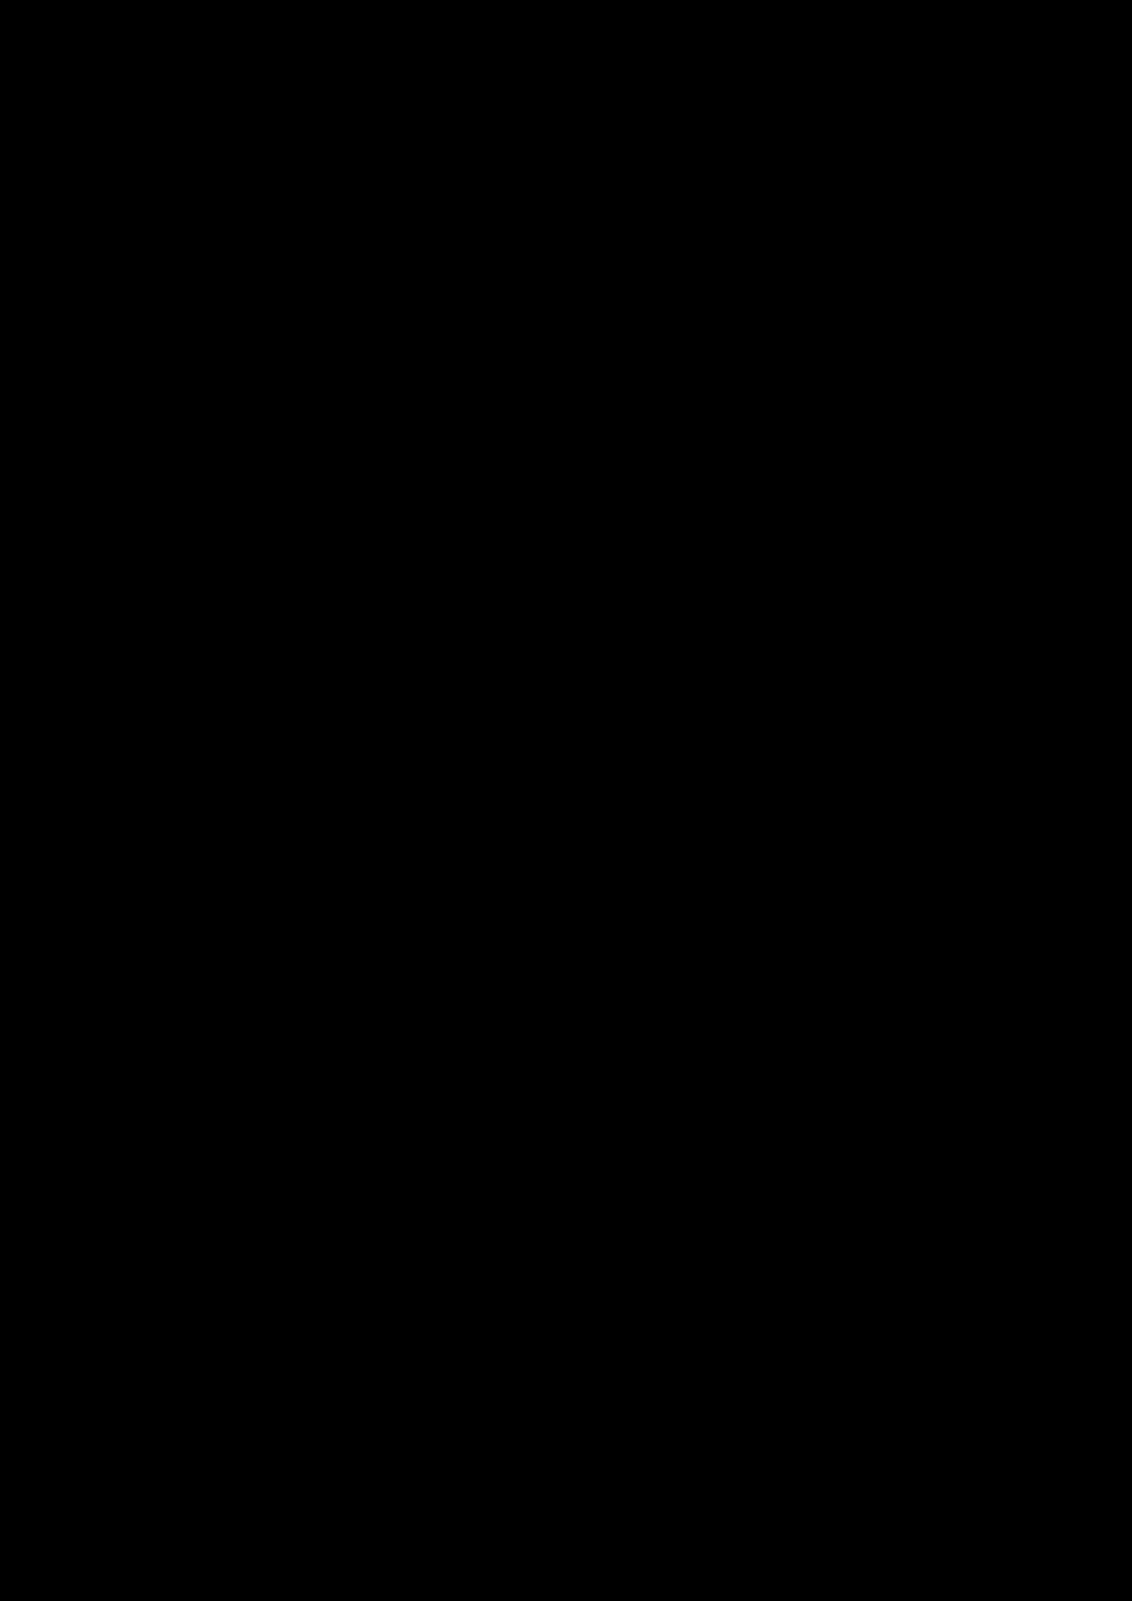 Belyiy sokol slide, Image 76